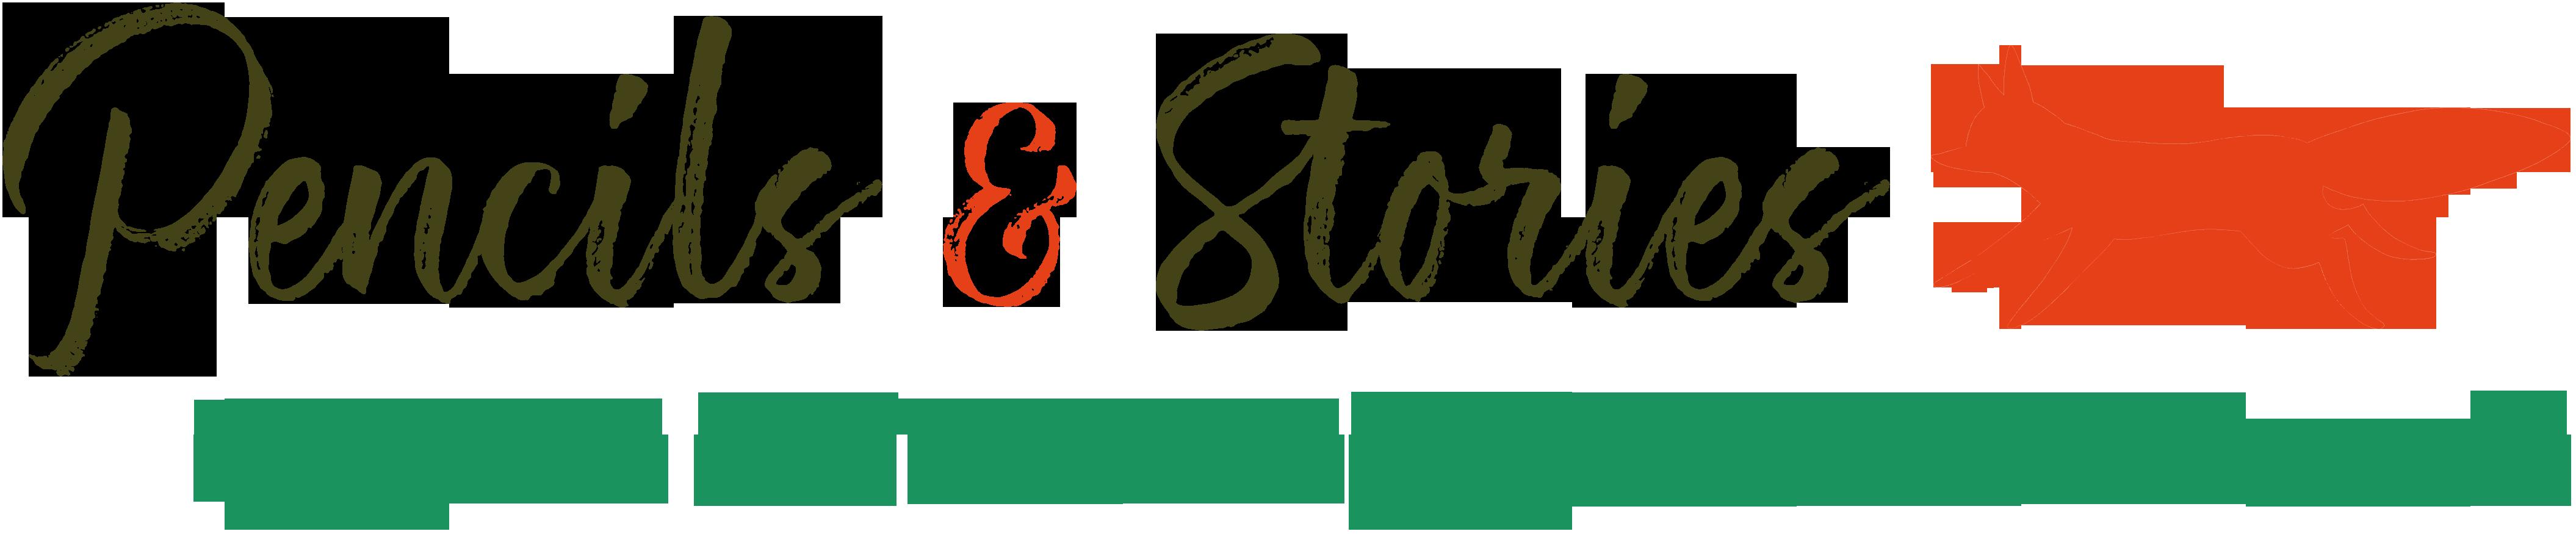 Pencils & Stories